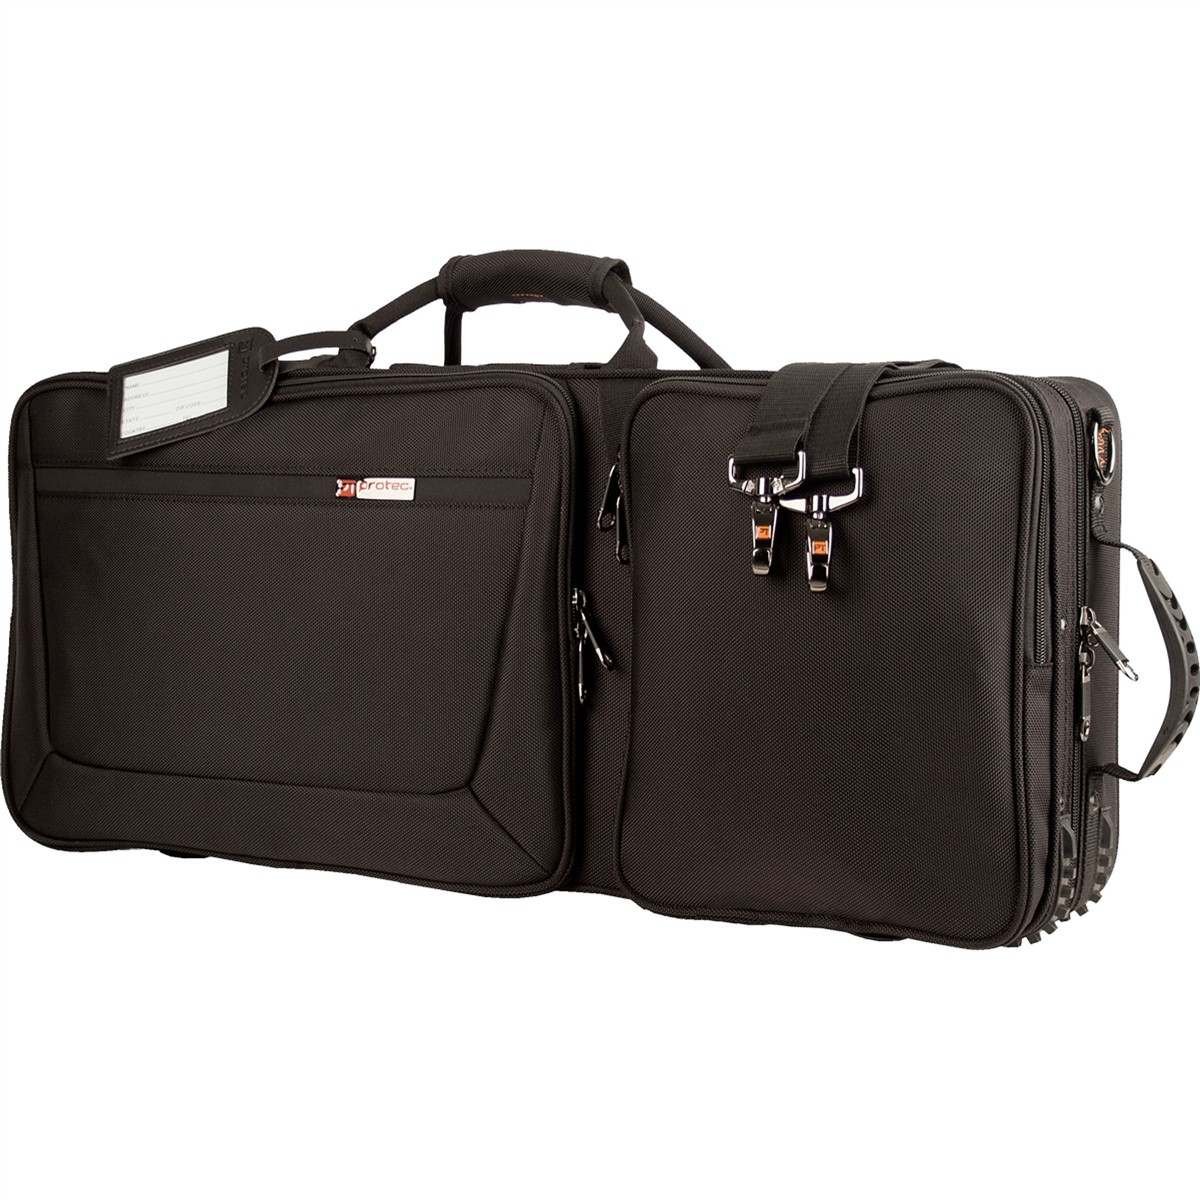 Protec Bassoon PRO PAC Case (PB317)